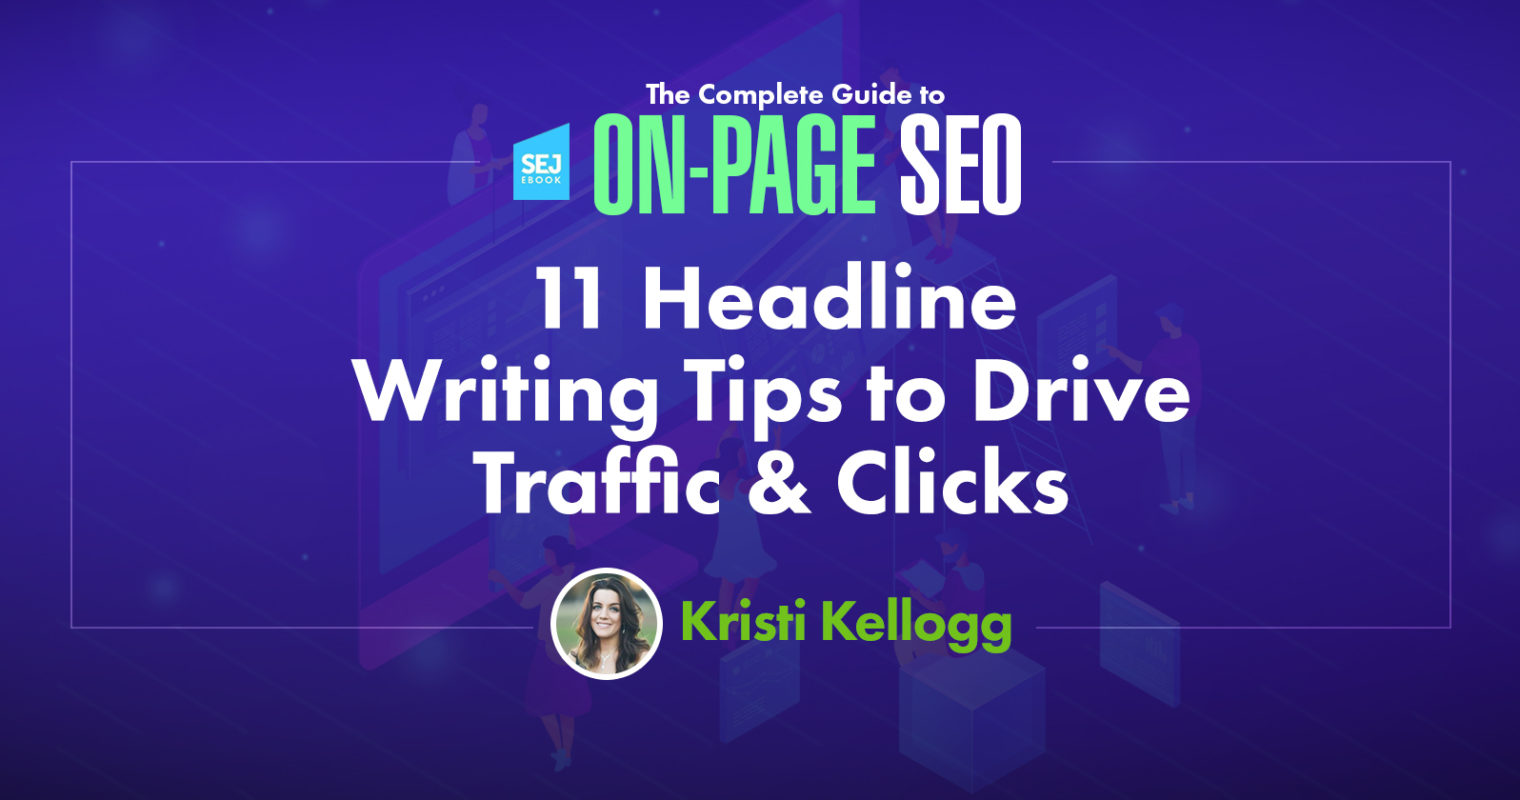 11 Headline Writing Tips to Drive Traffic & Clicks